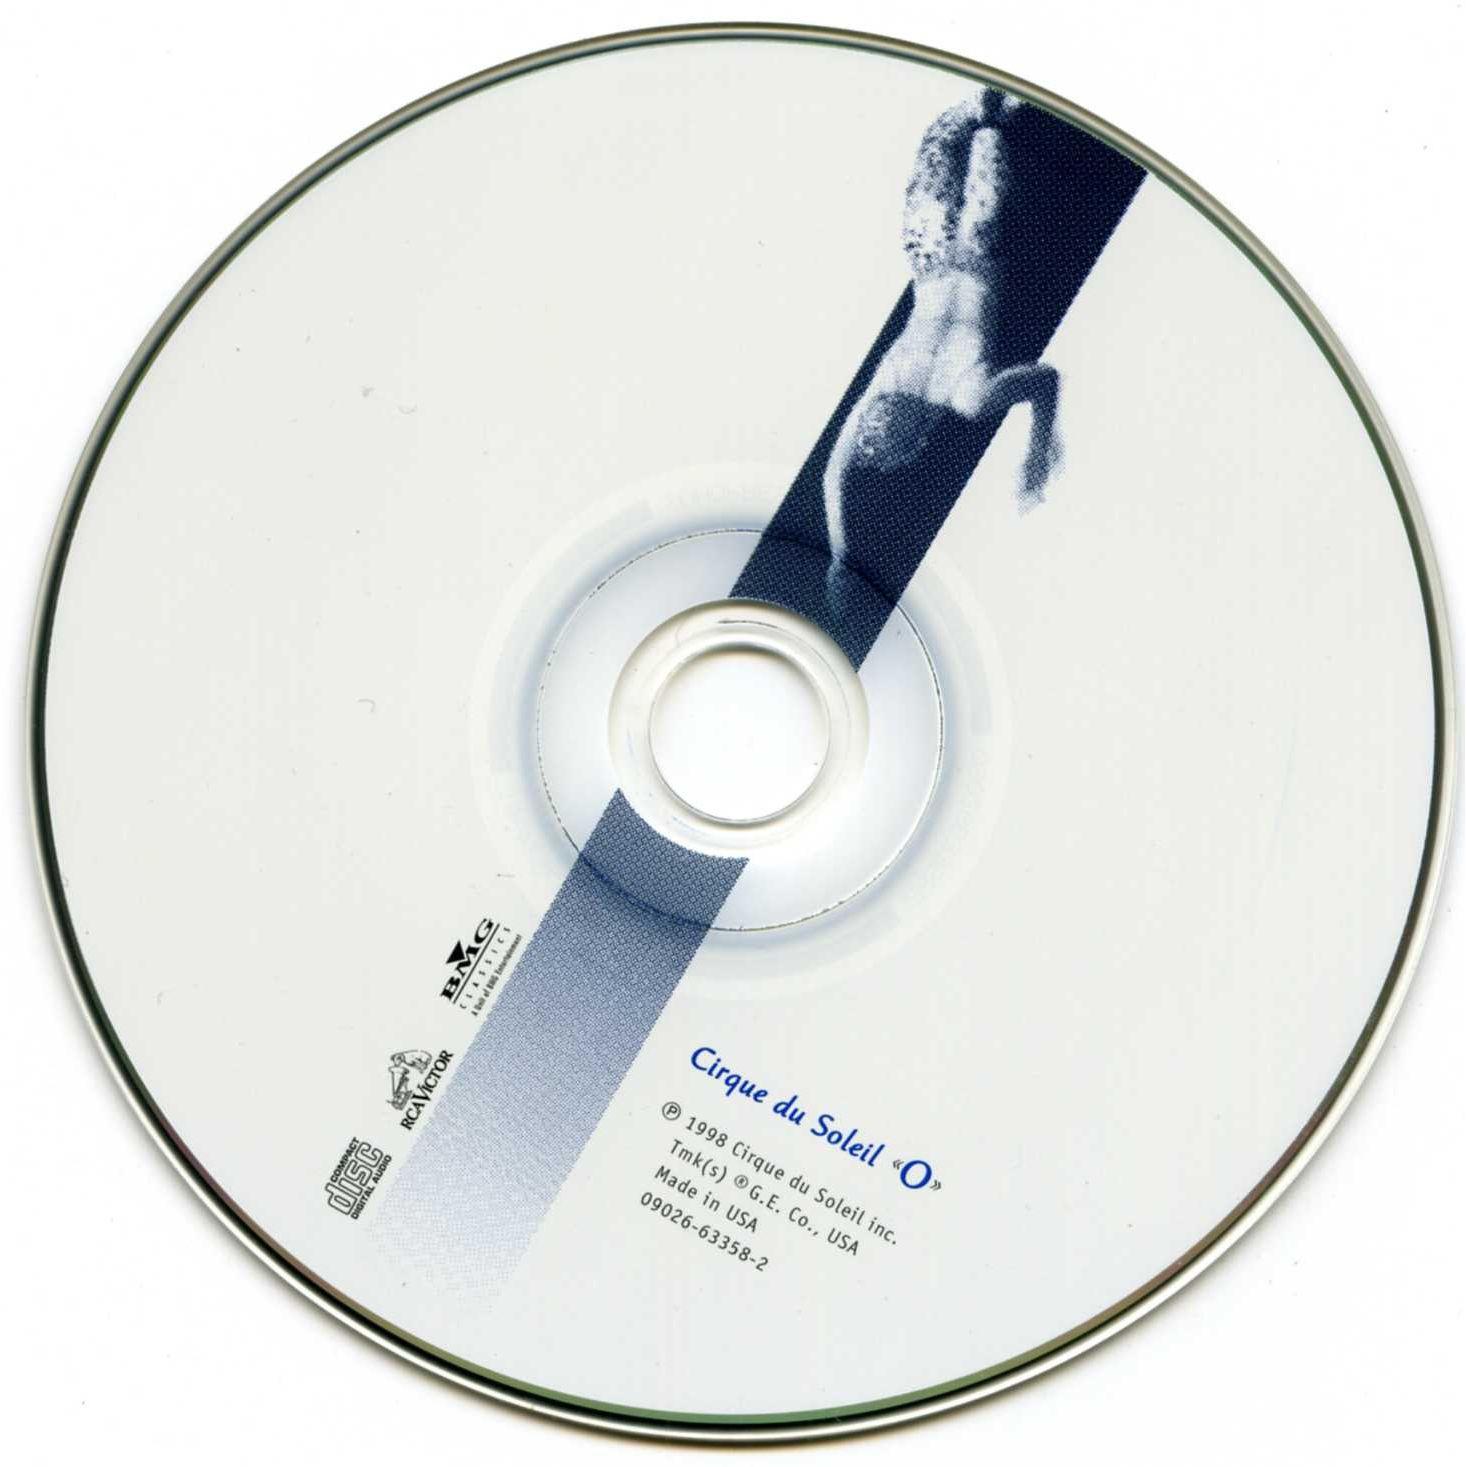 O» - Cirque Du Soleil Mp3 Buy, Full Tracklist intérieur Musique Cirque Mp3